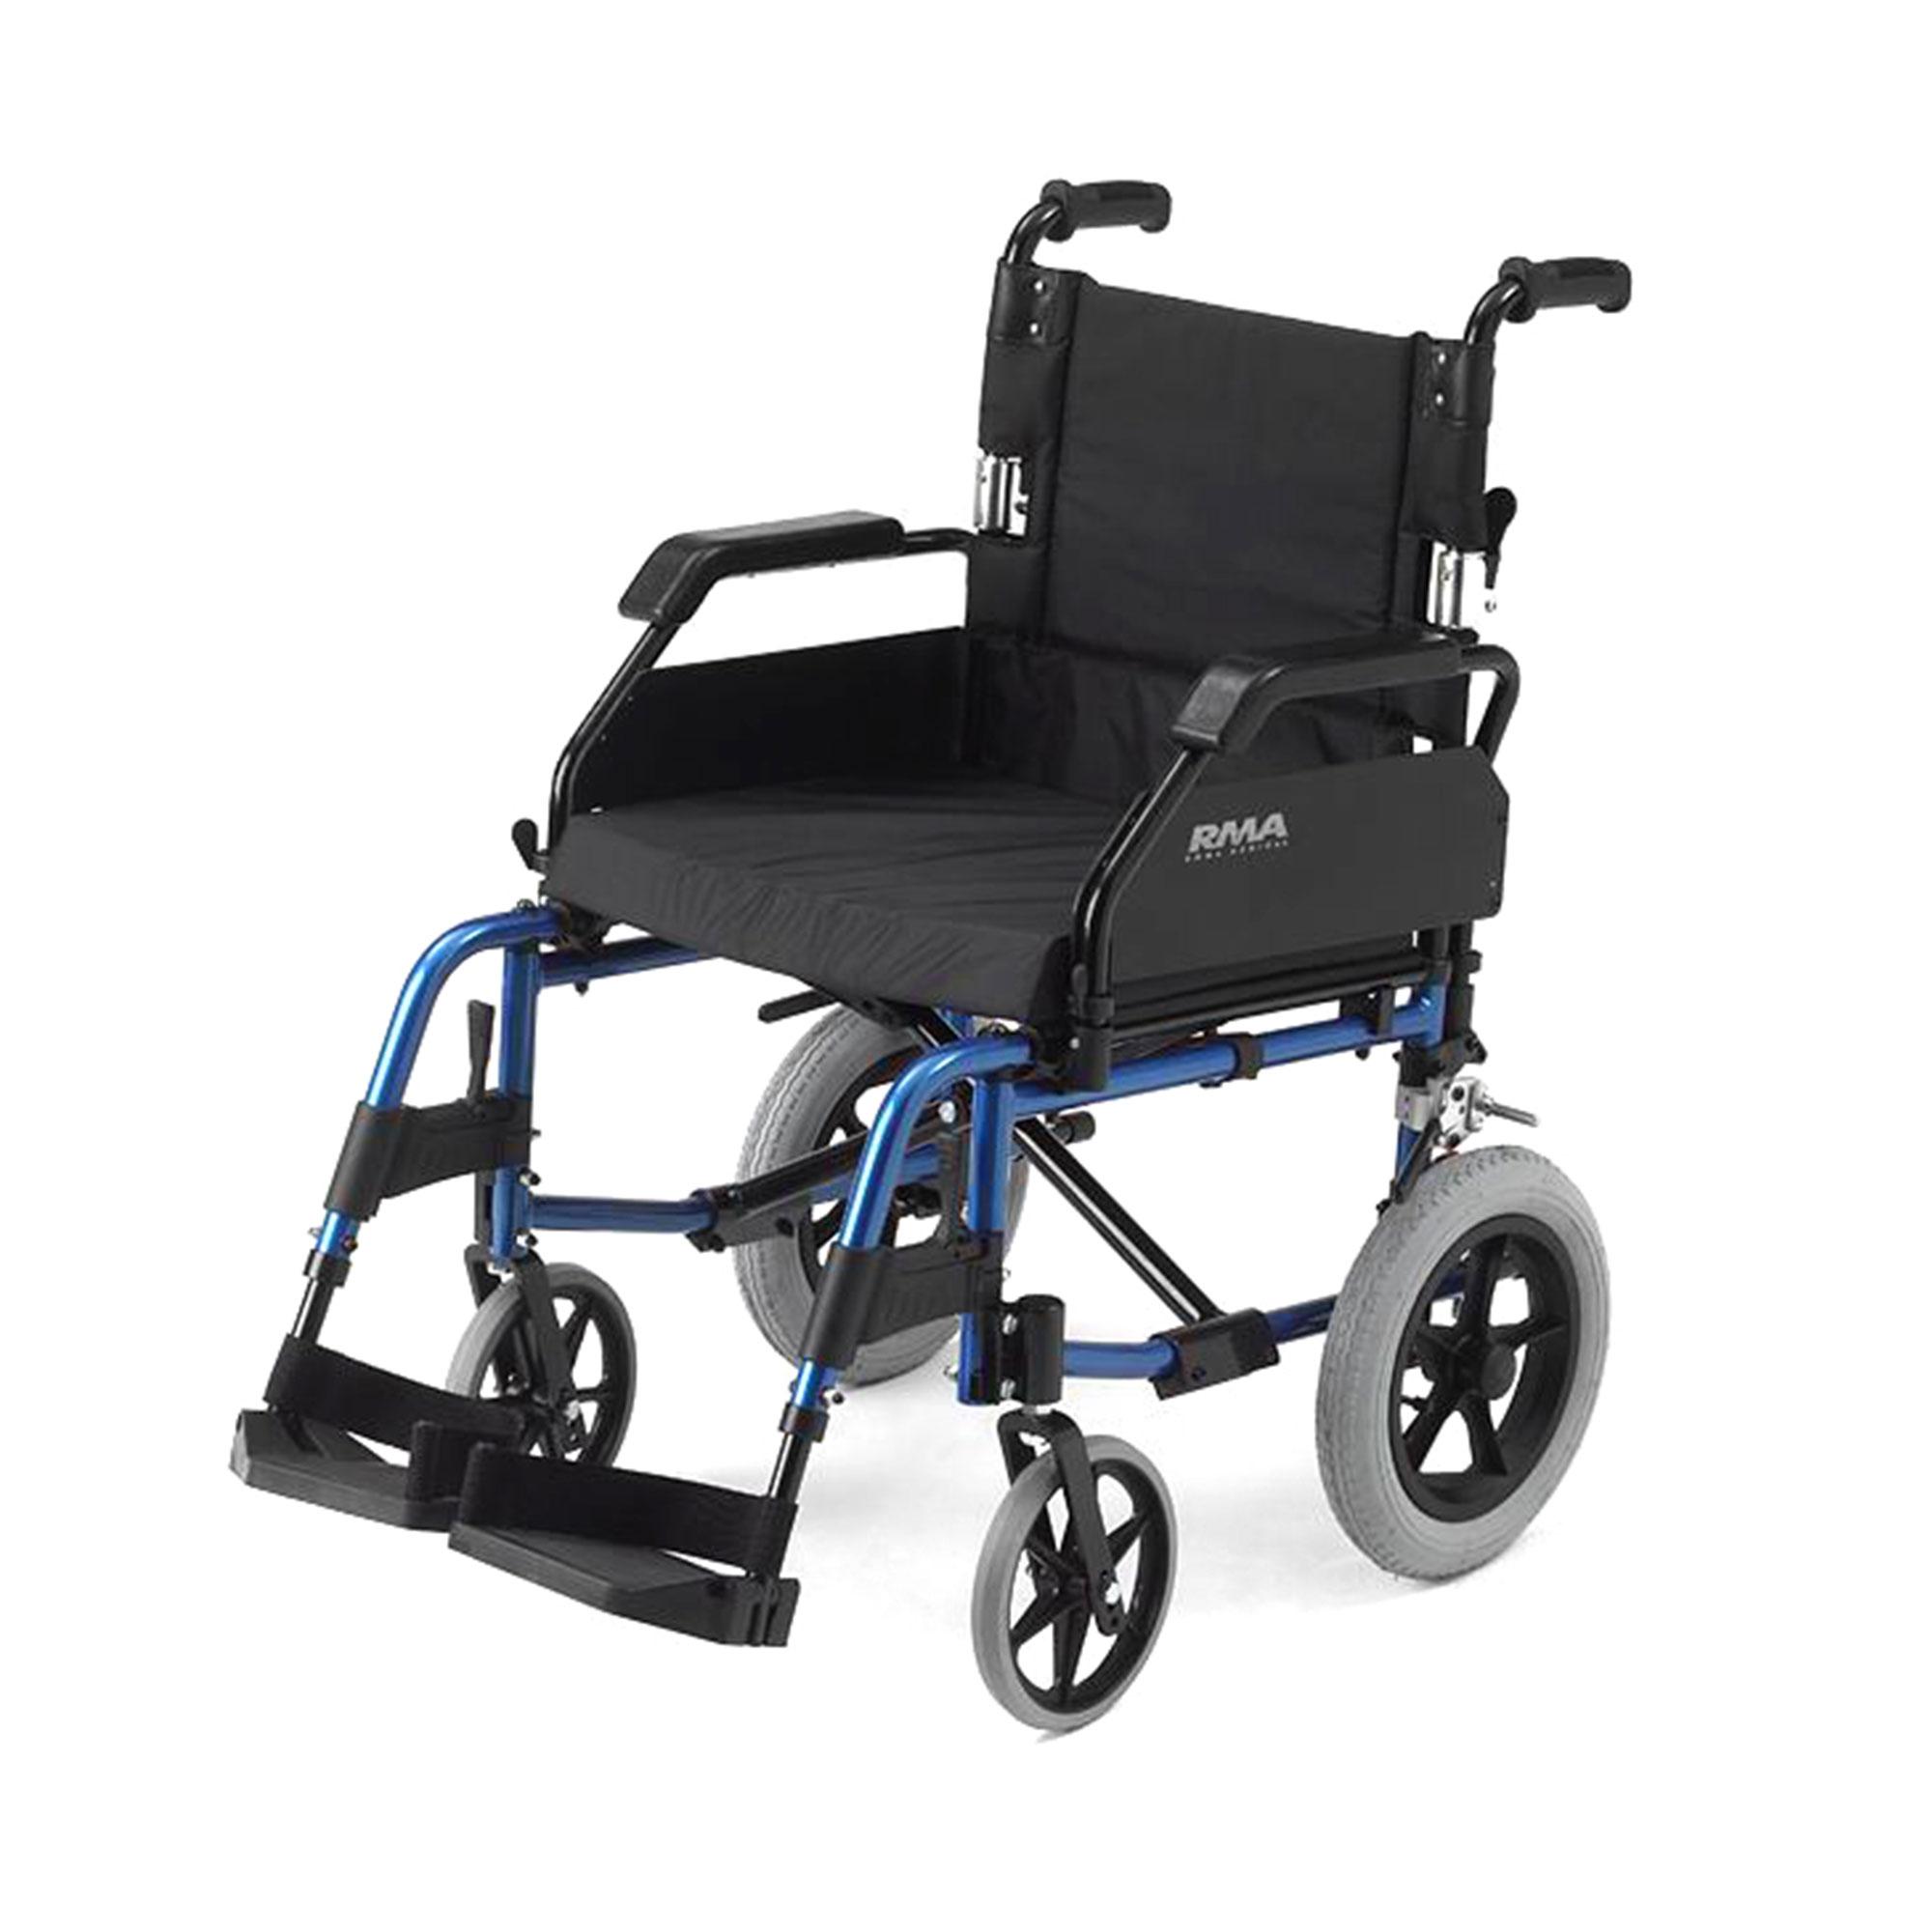 1530 Lightweight Car Transit Wheelchair Roma Medical